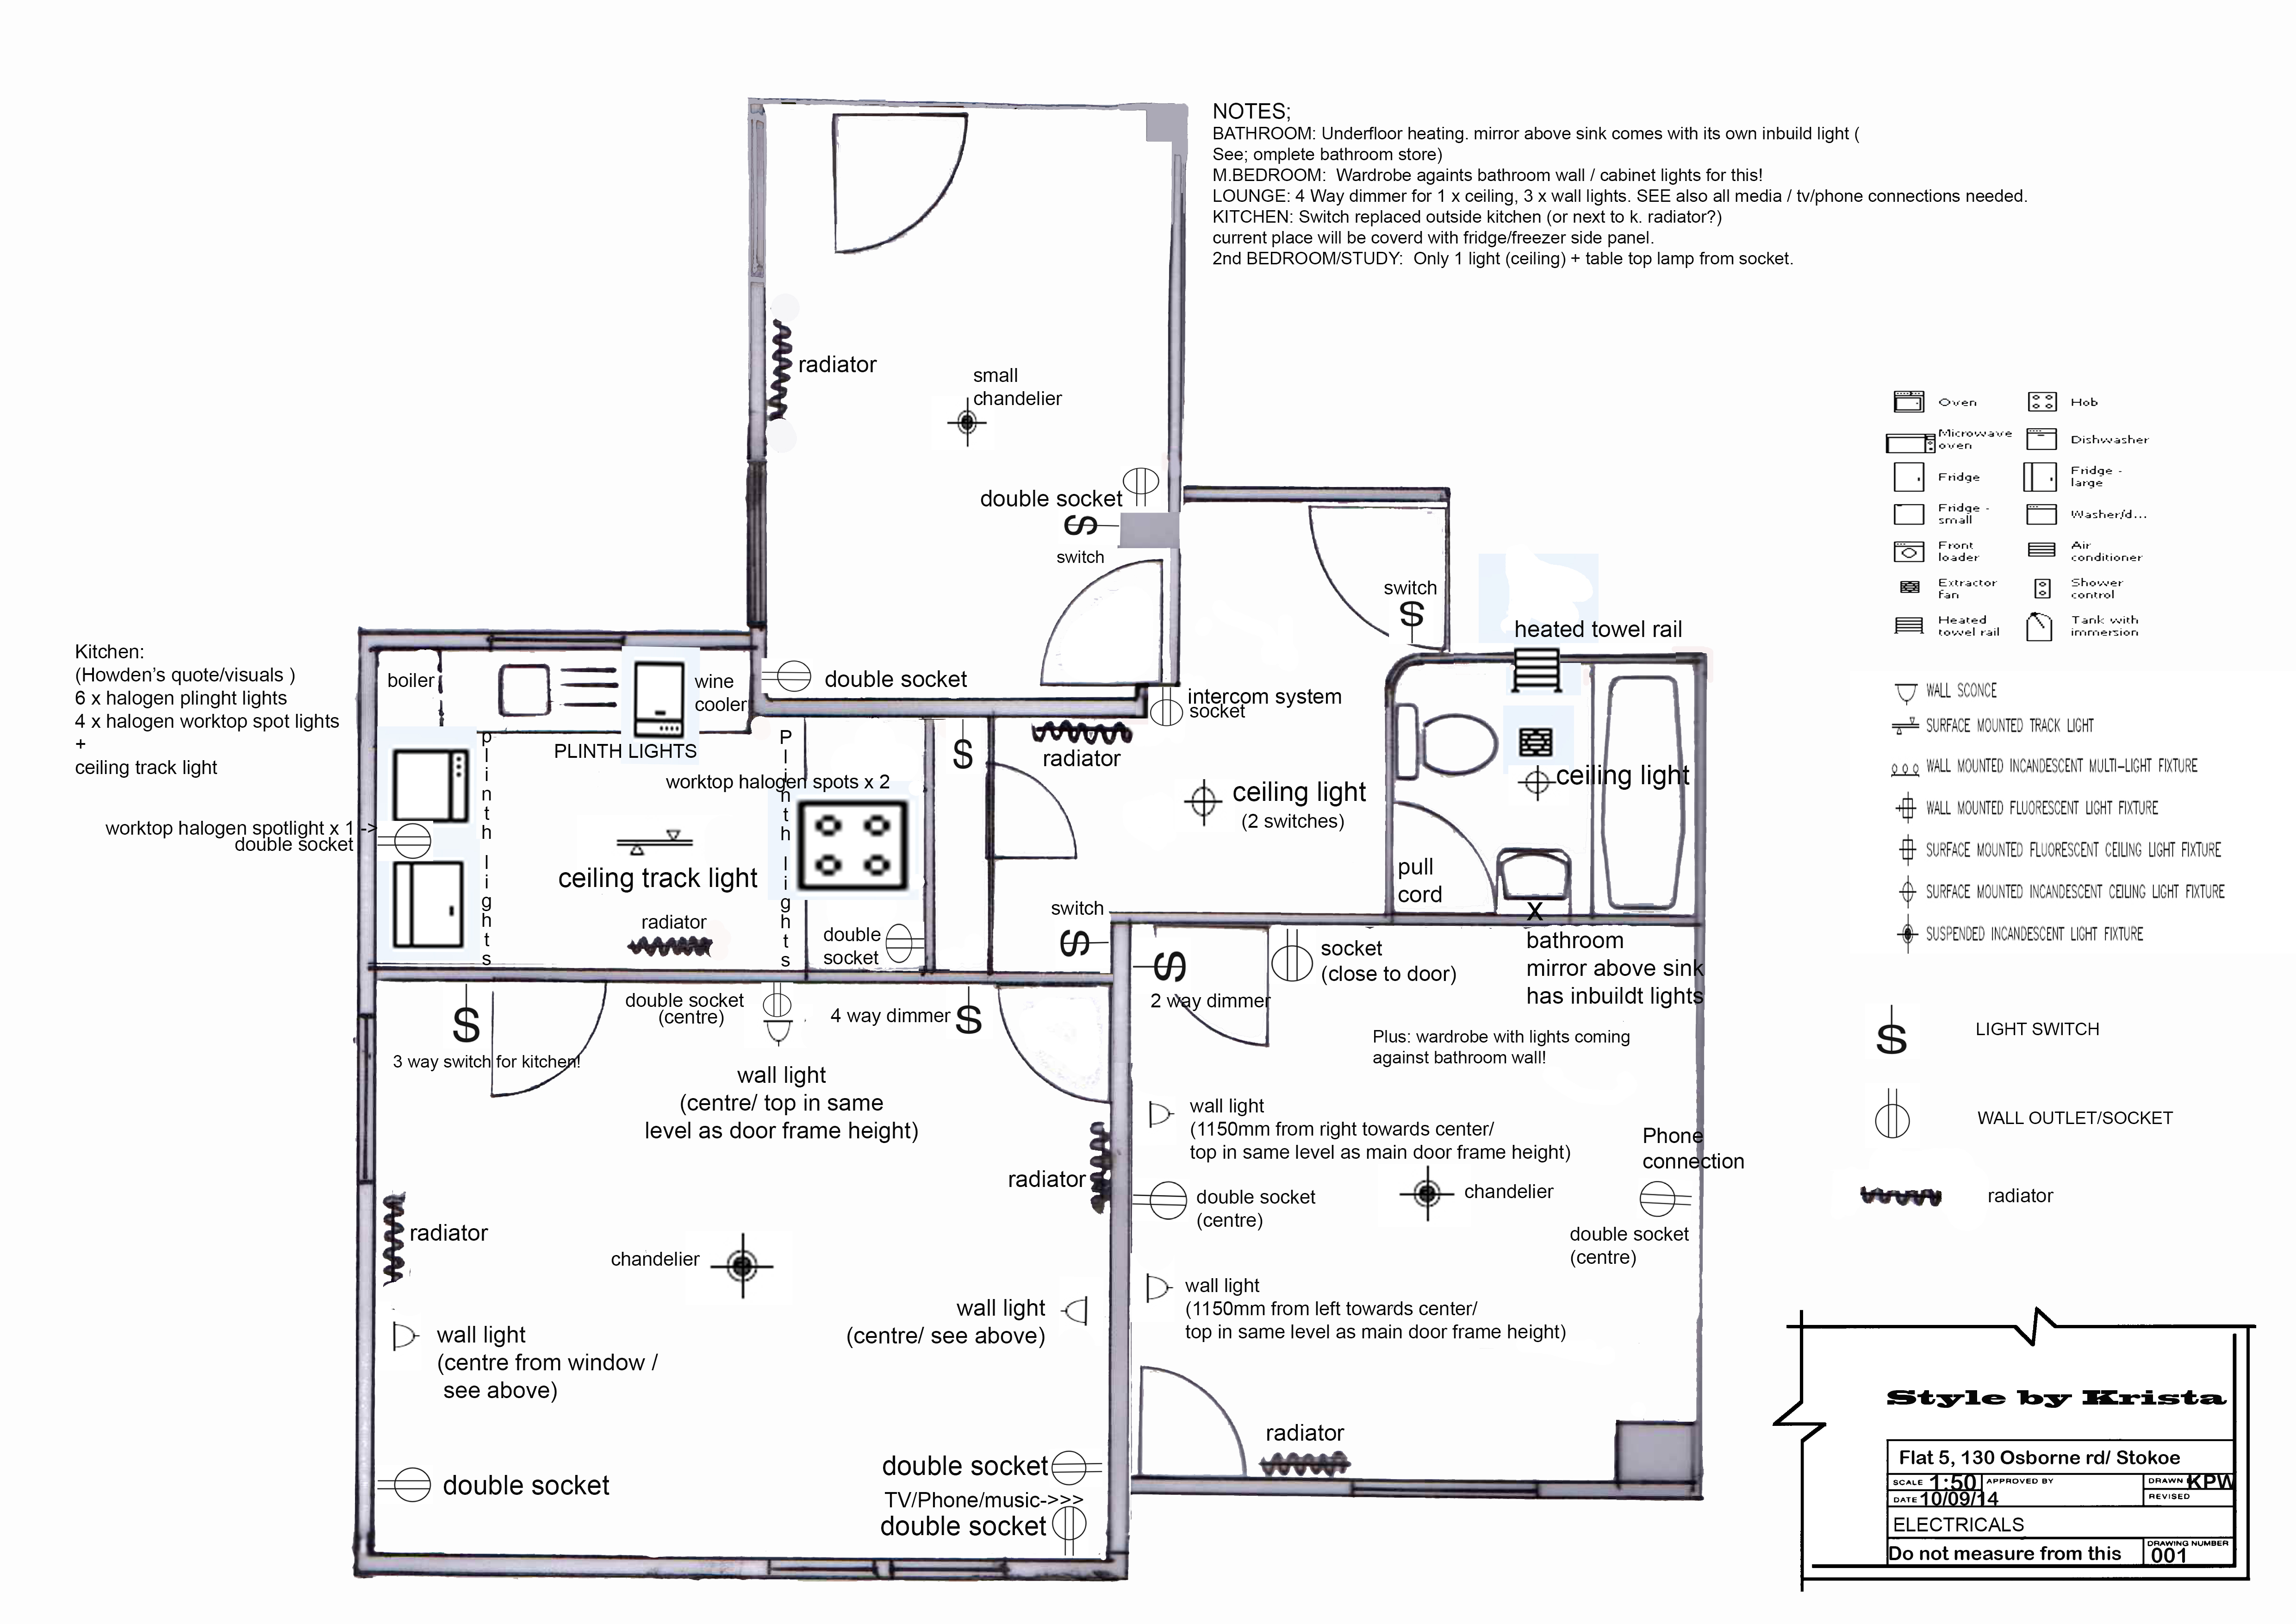 Basic Residential Electrical Wiring - Merzie.net